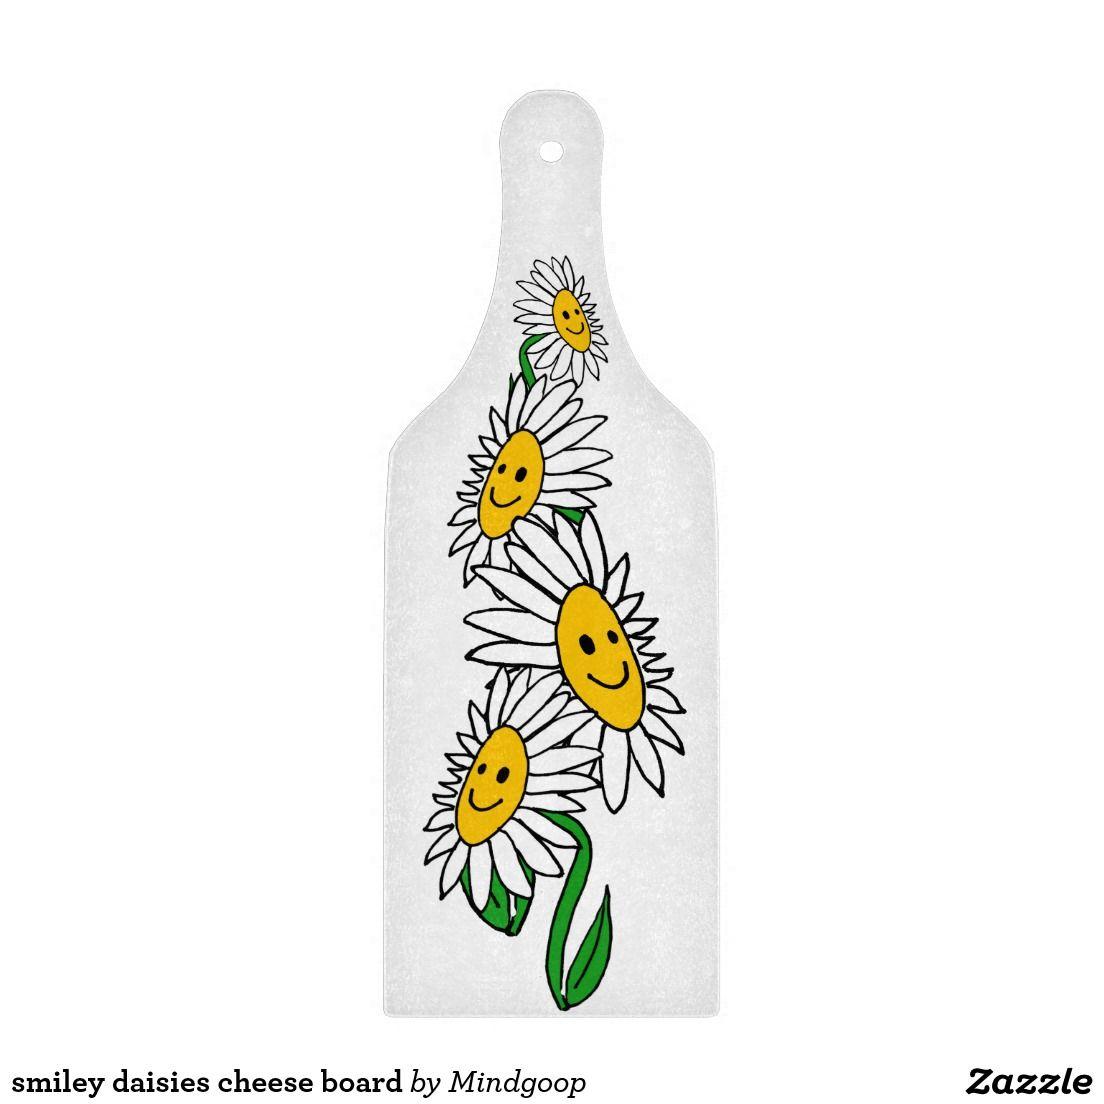 smiley daisies cheese board cutting board